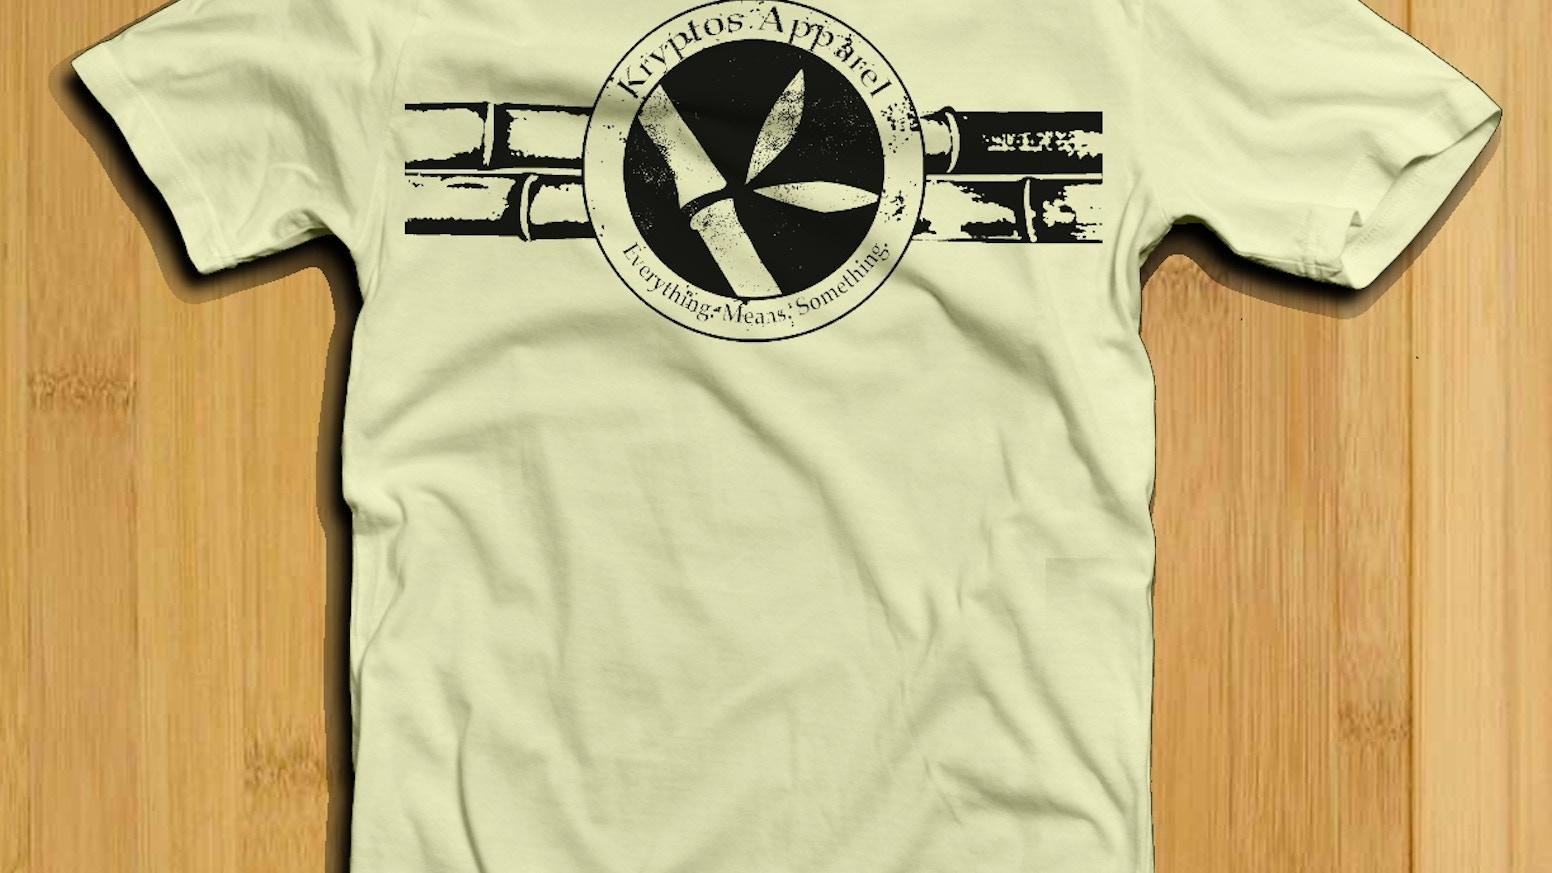 acf93424efae Environmentally Friendly Bamboo T-shirt by Darrell Henderson ...